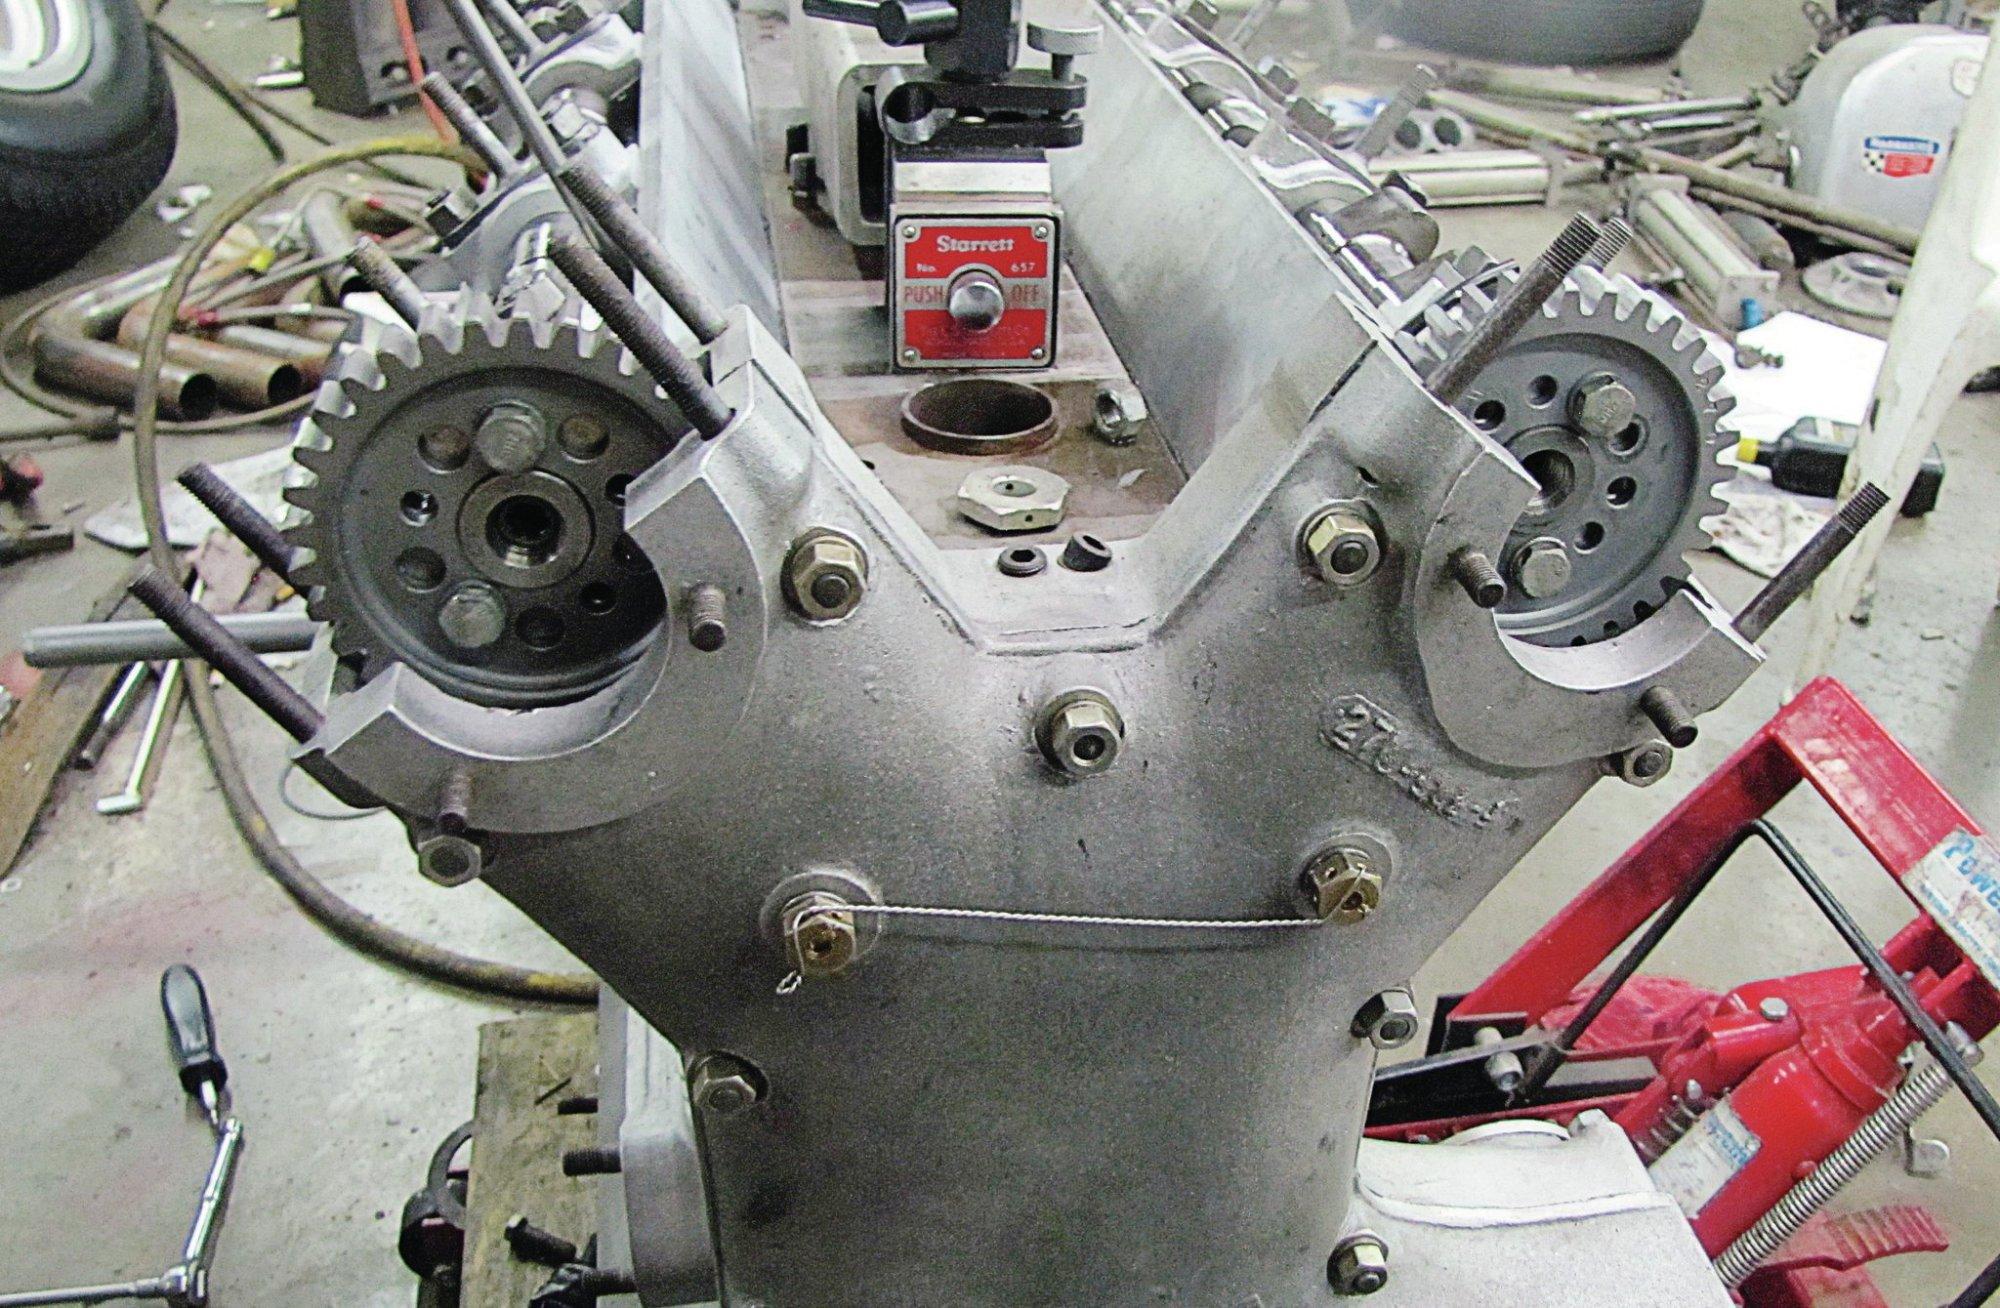 hight resolution of assembling a 270ci offenhauser indycar engine step by step hot rh hotrod com overhead valve engine